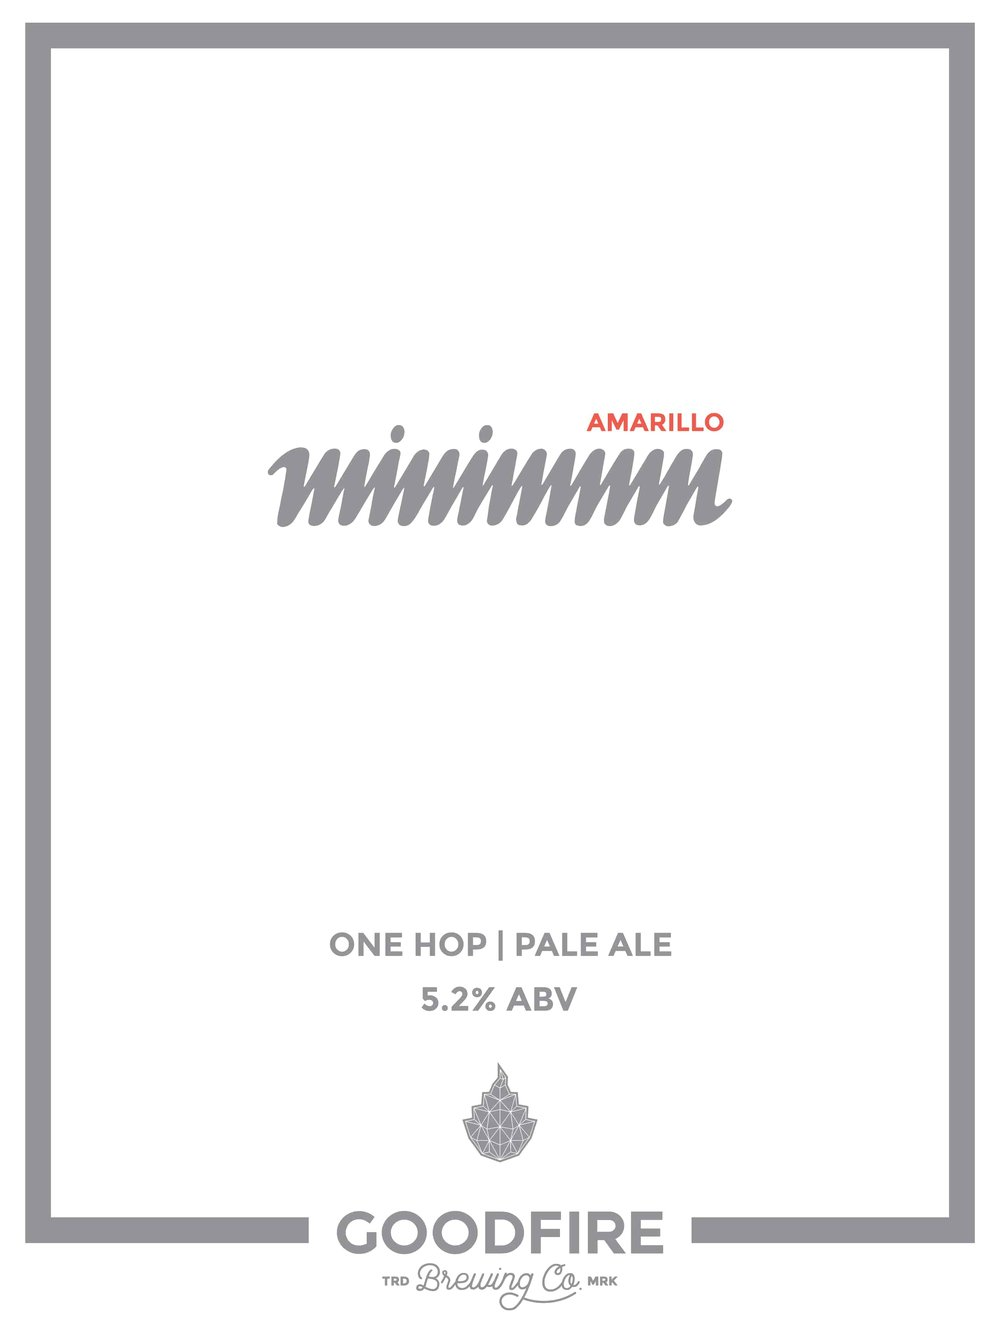 Goodfire Minimum - Amarillo Poster.jpg